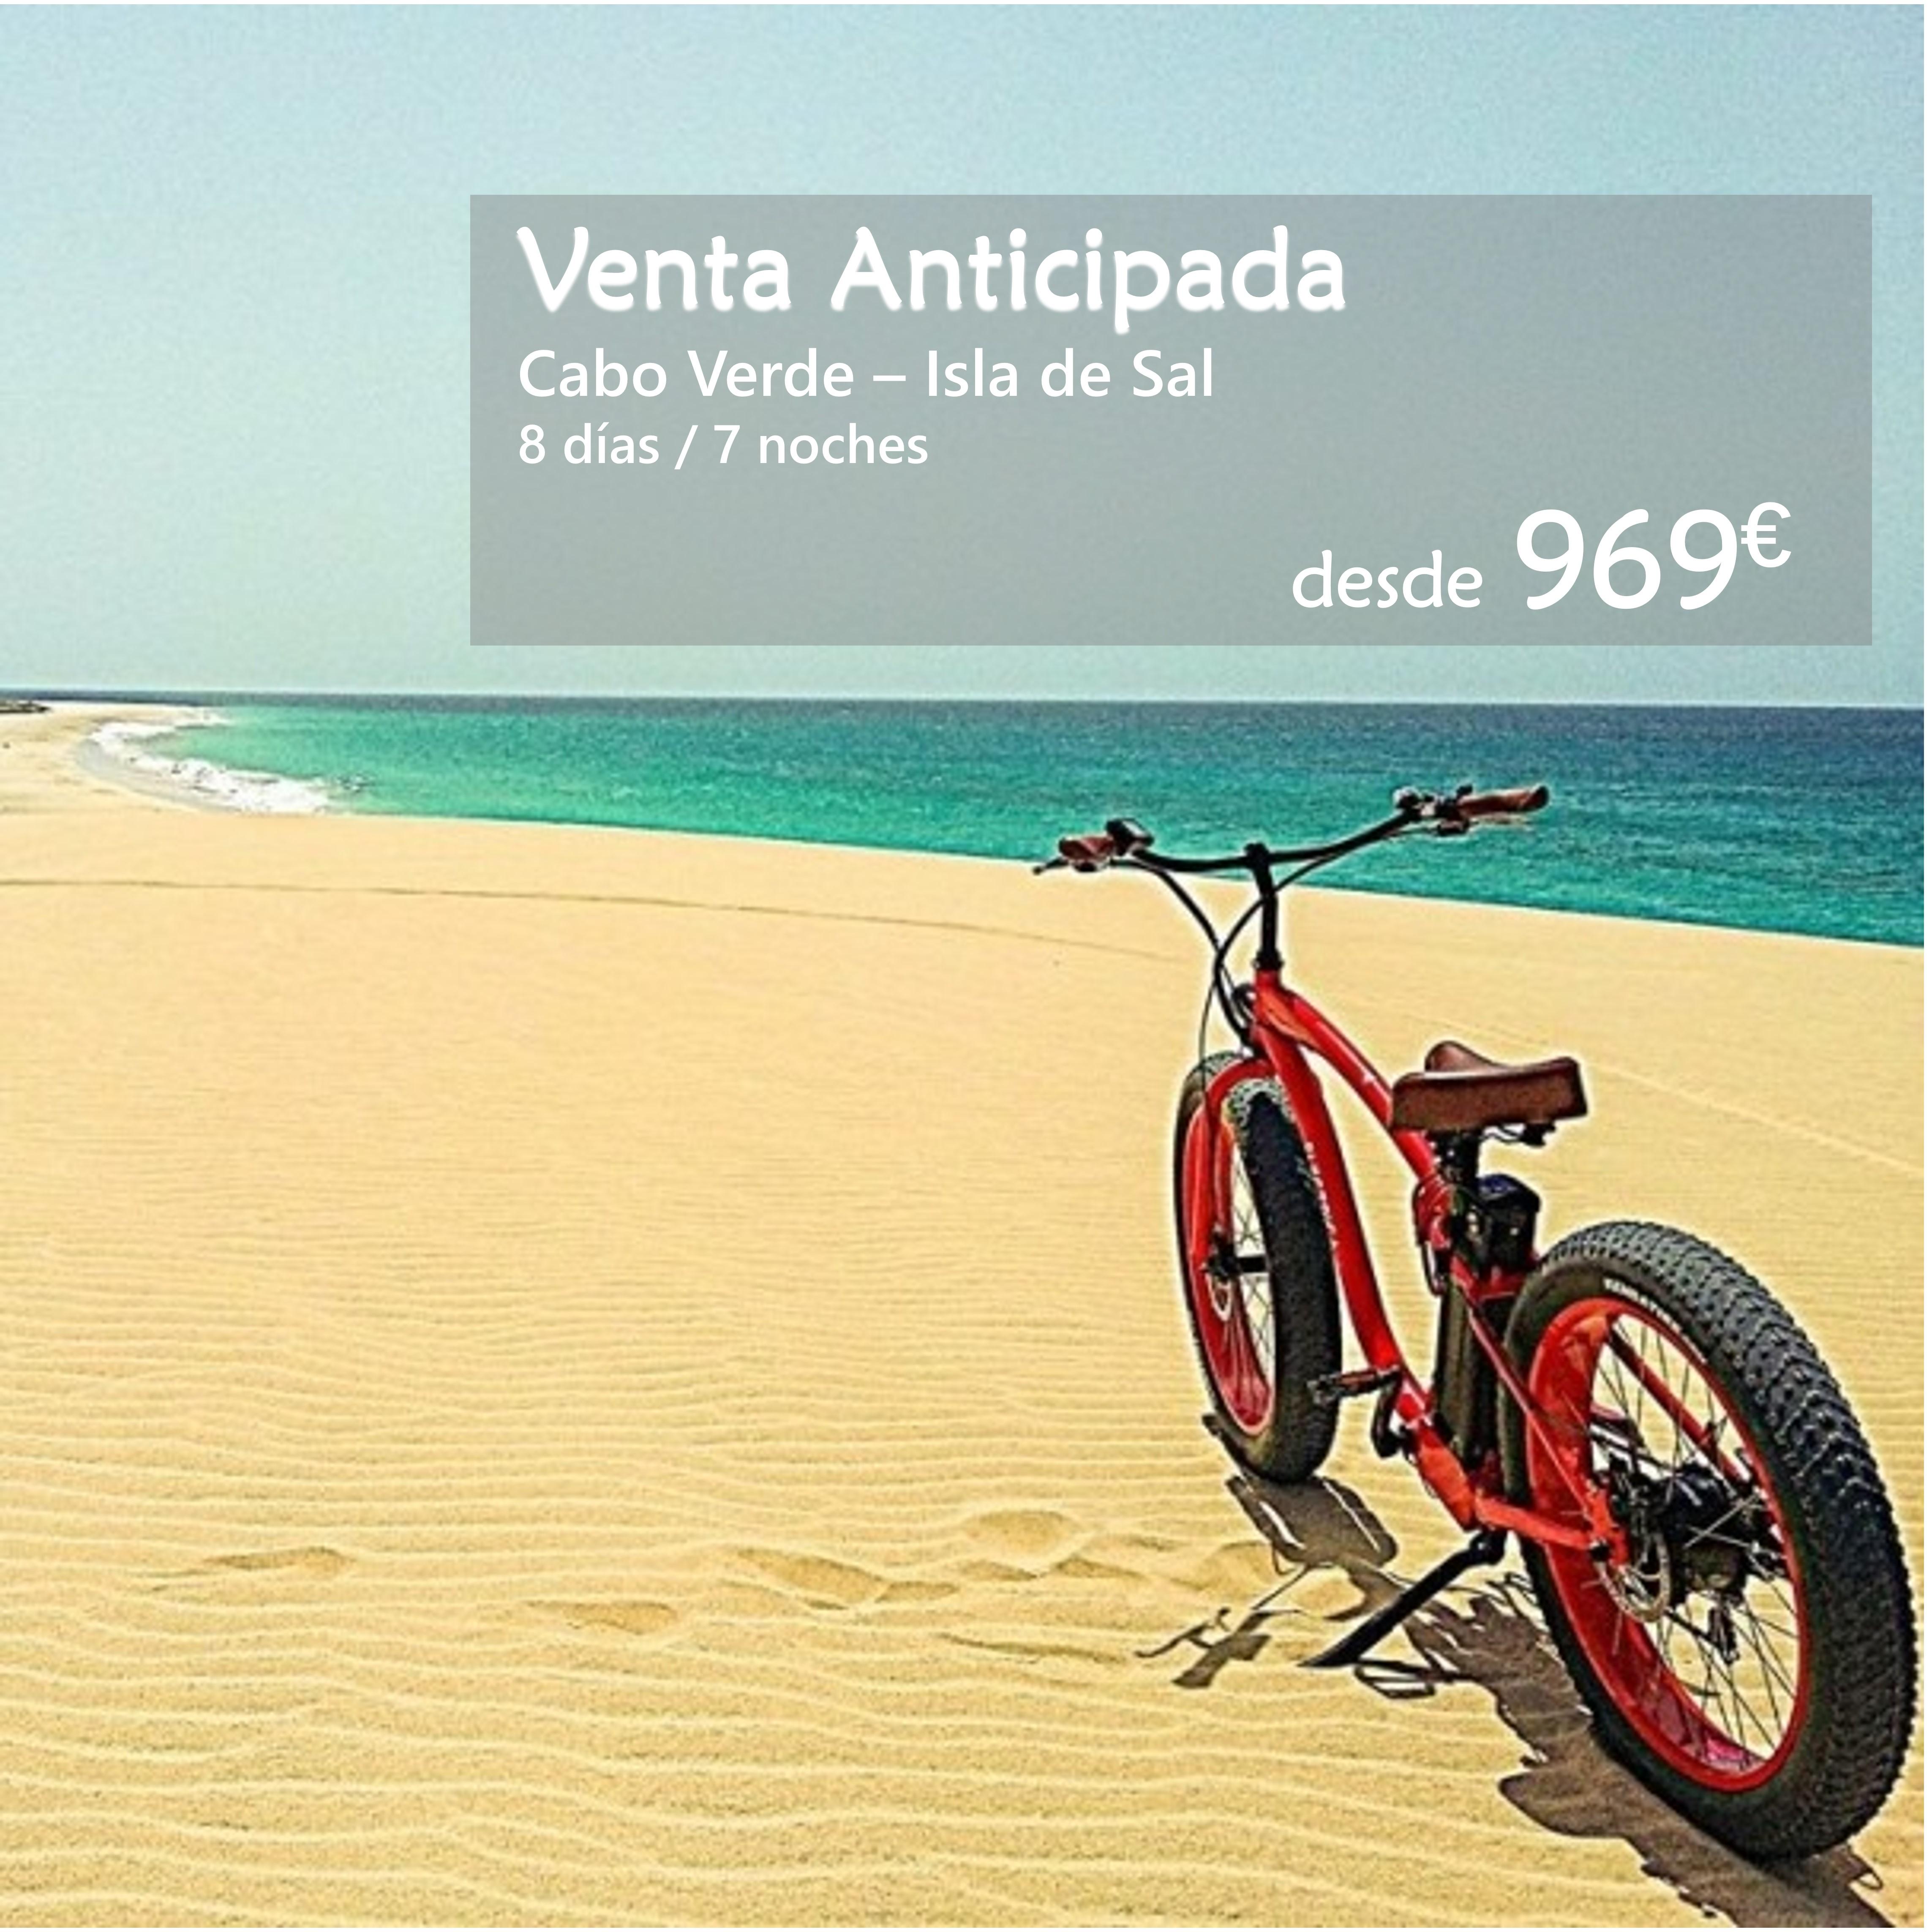 Venta Anticipada Cabo Verde